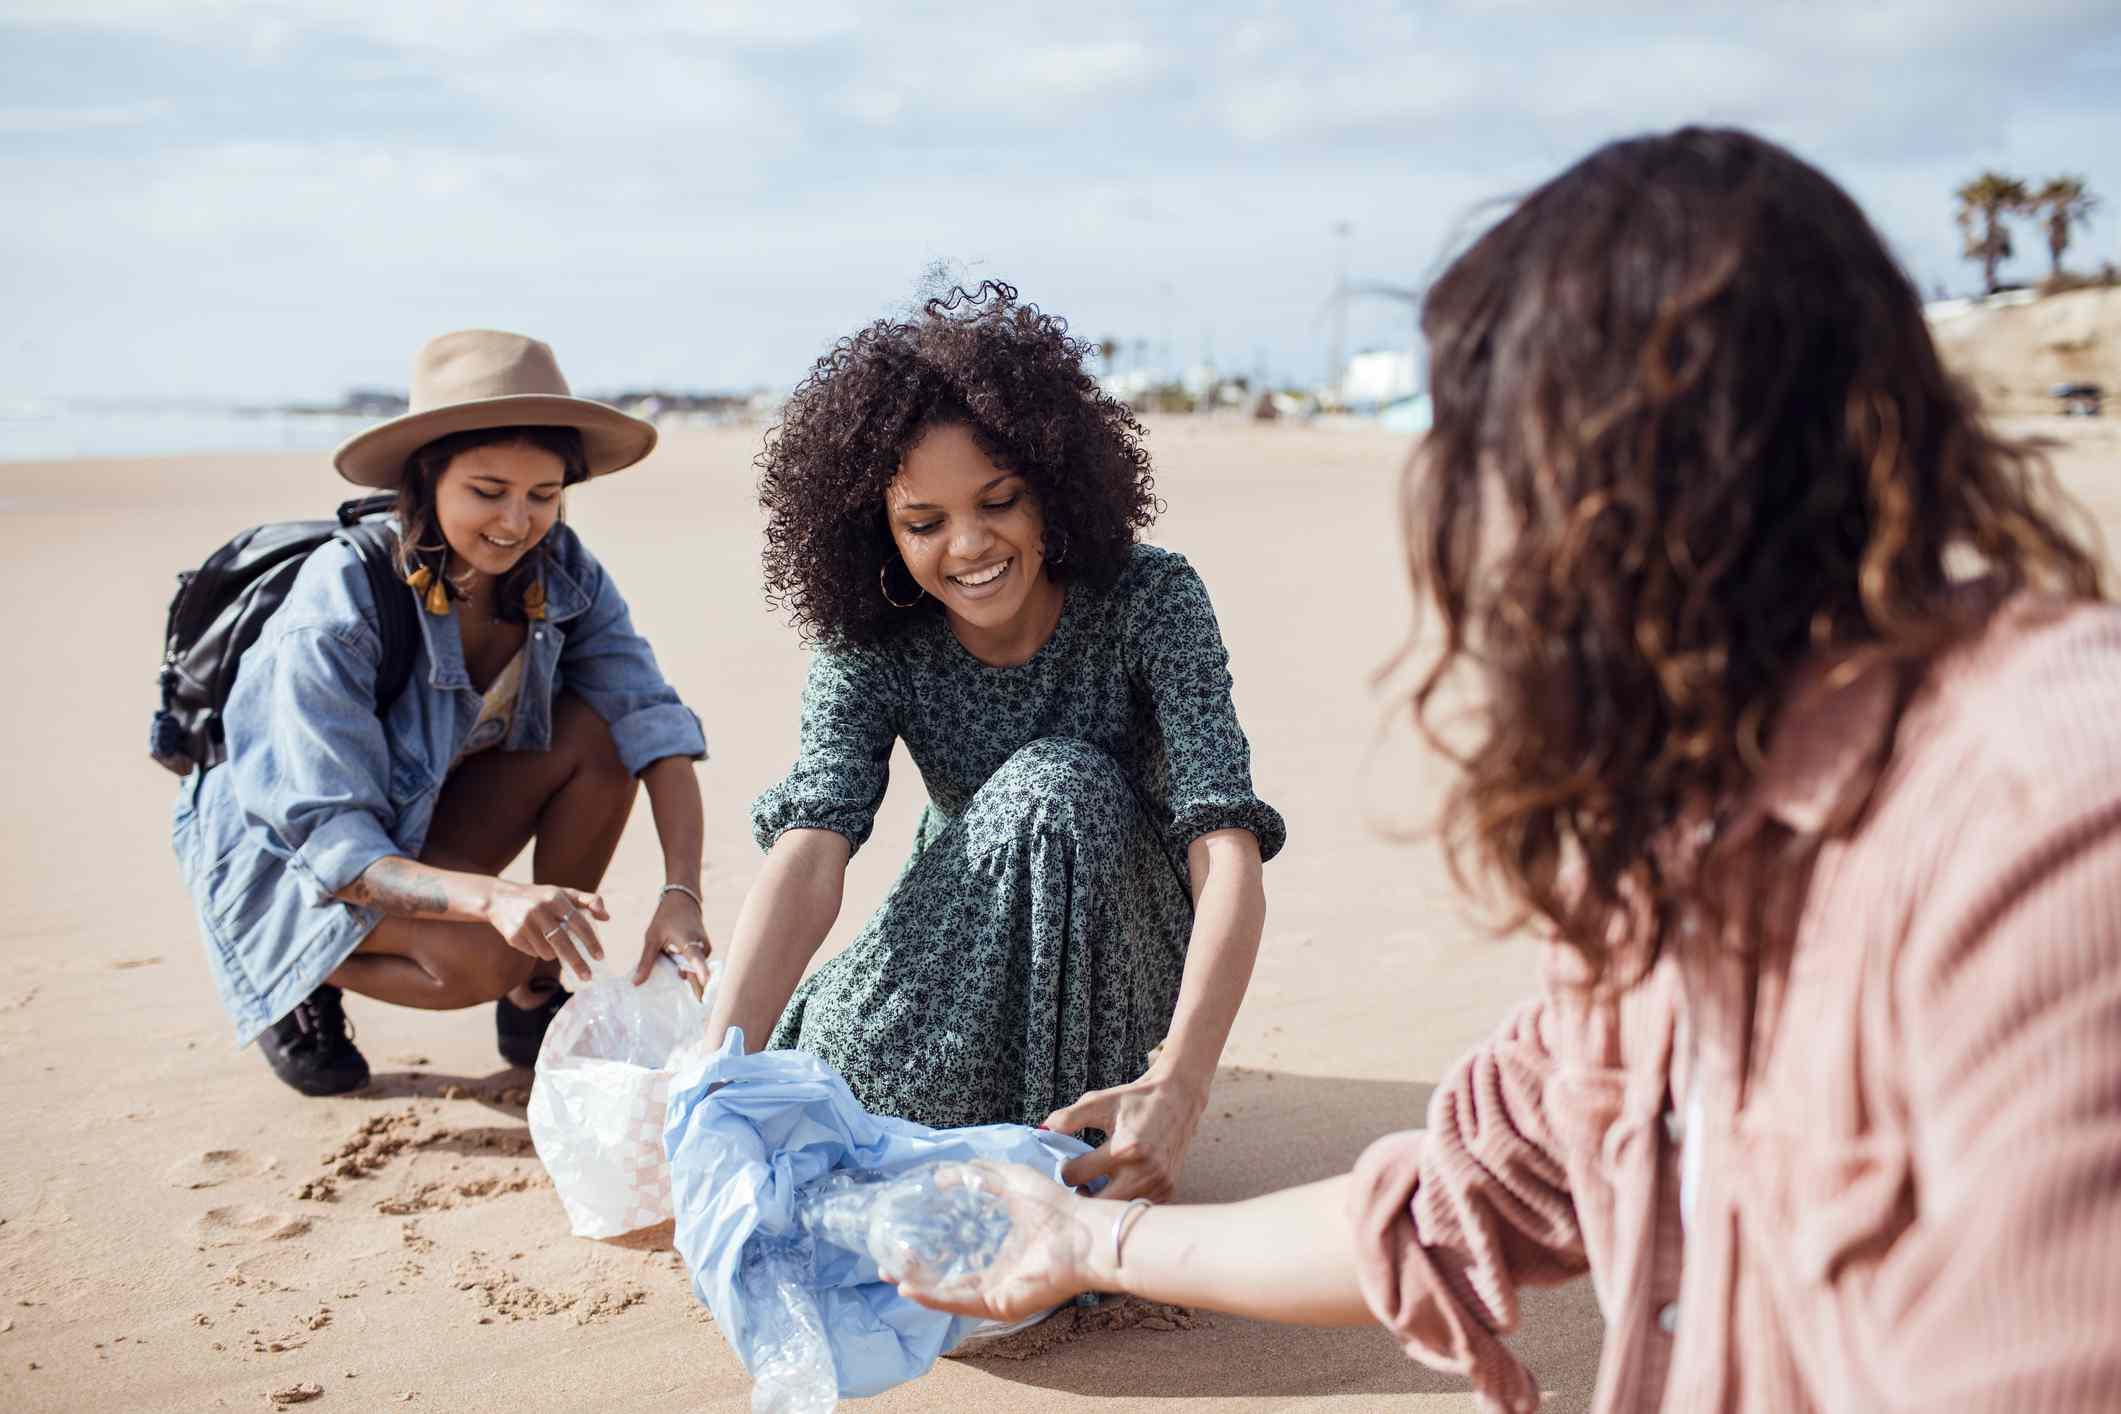 Friends at a beach cleanup